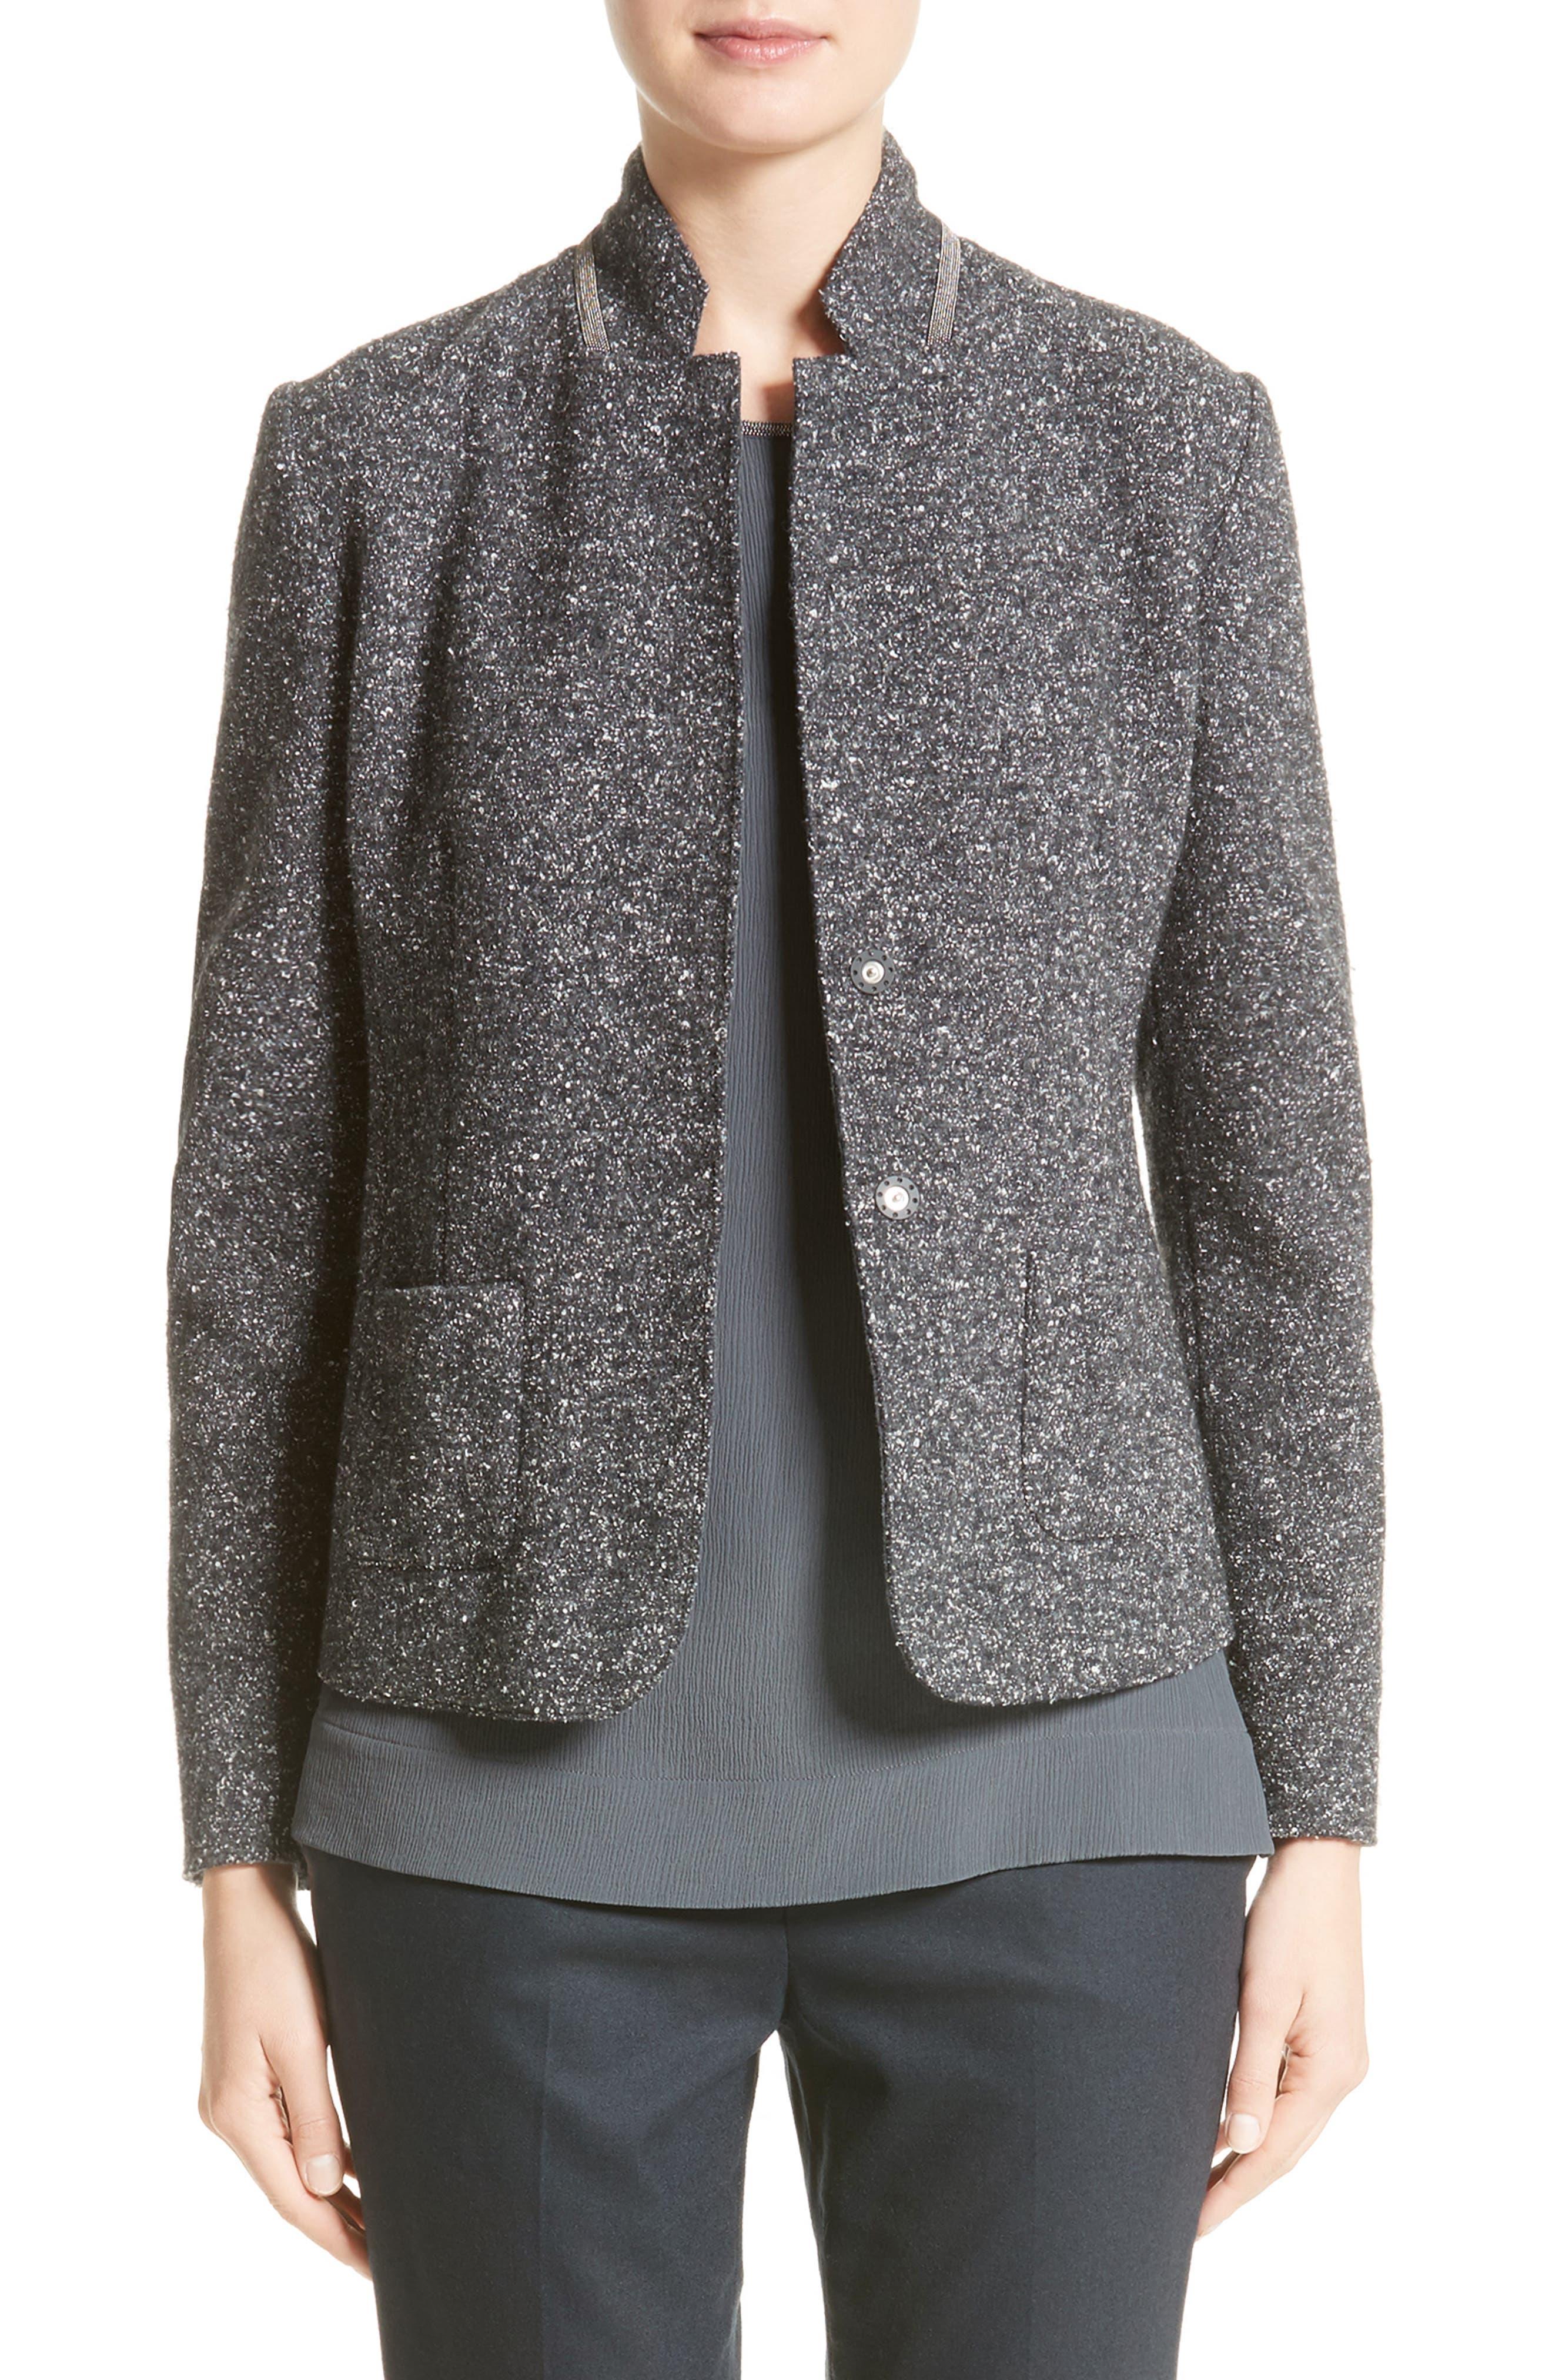 Pebble Tweed Knit Jacket,                         Main,                         color,